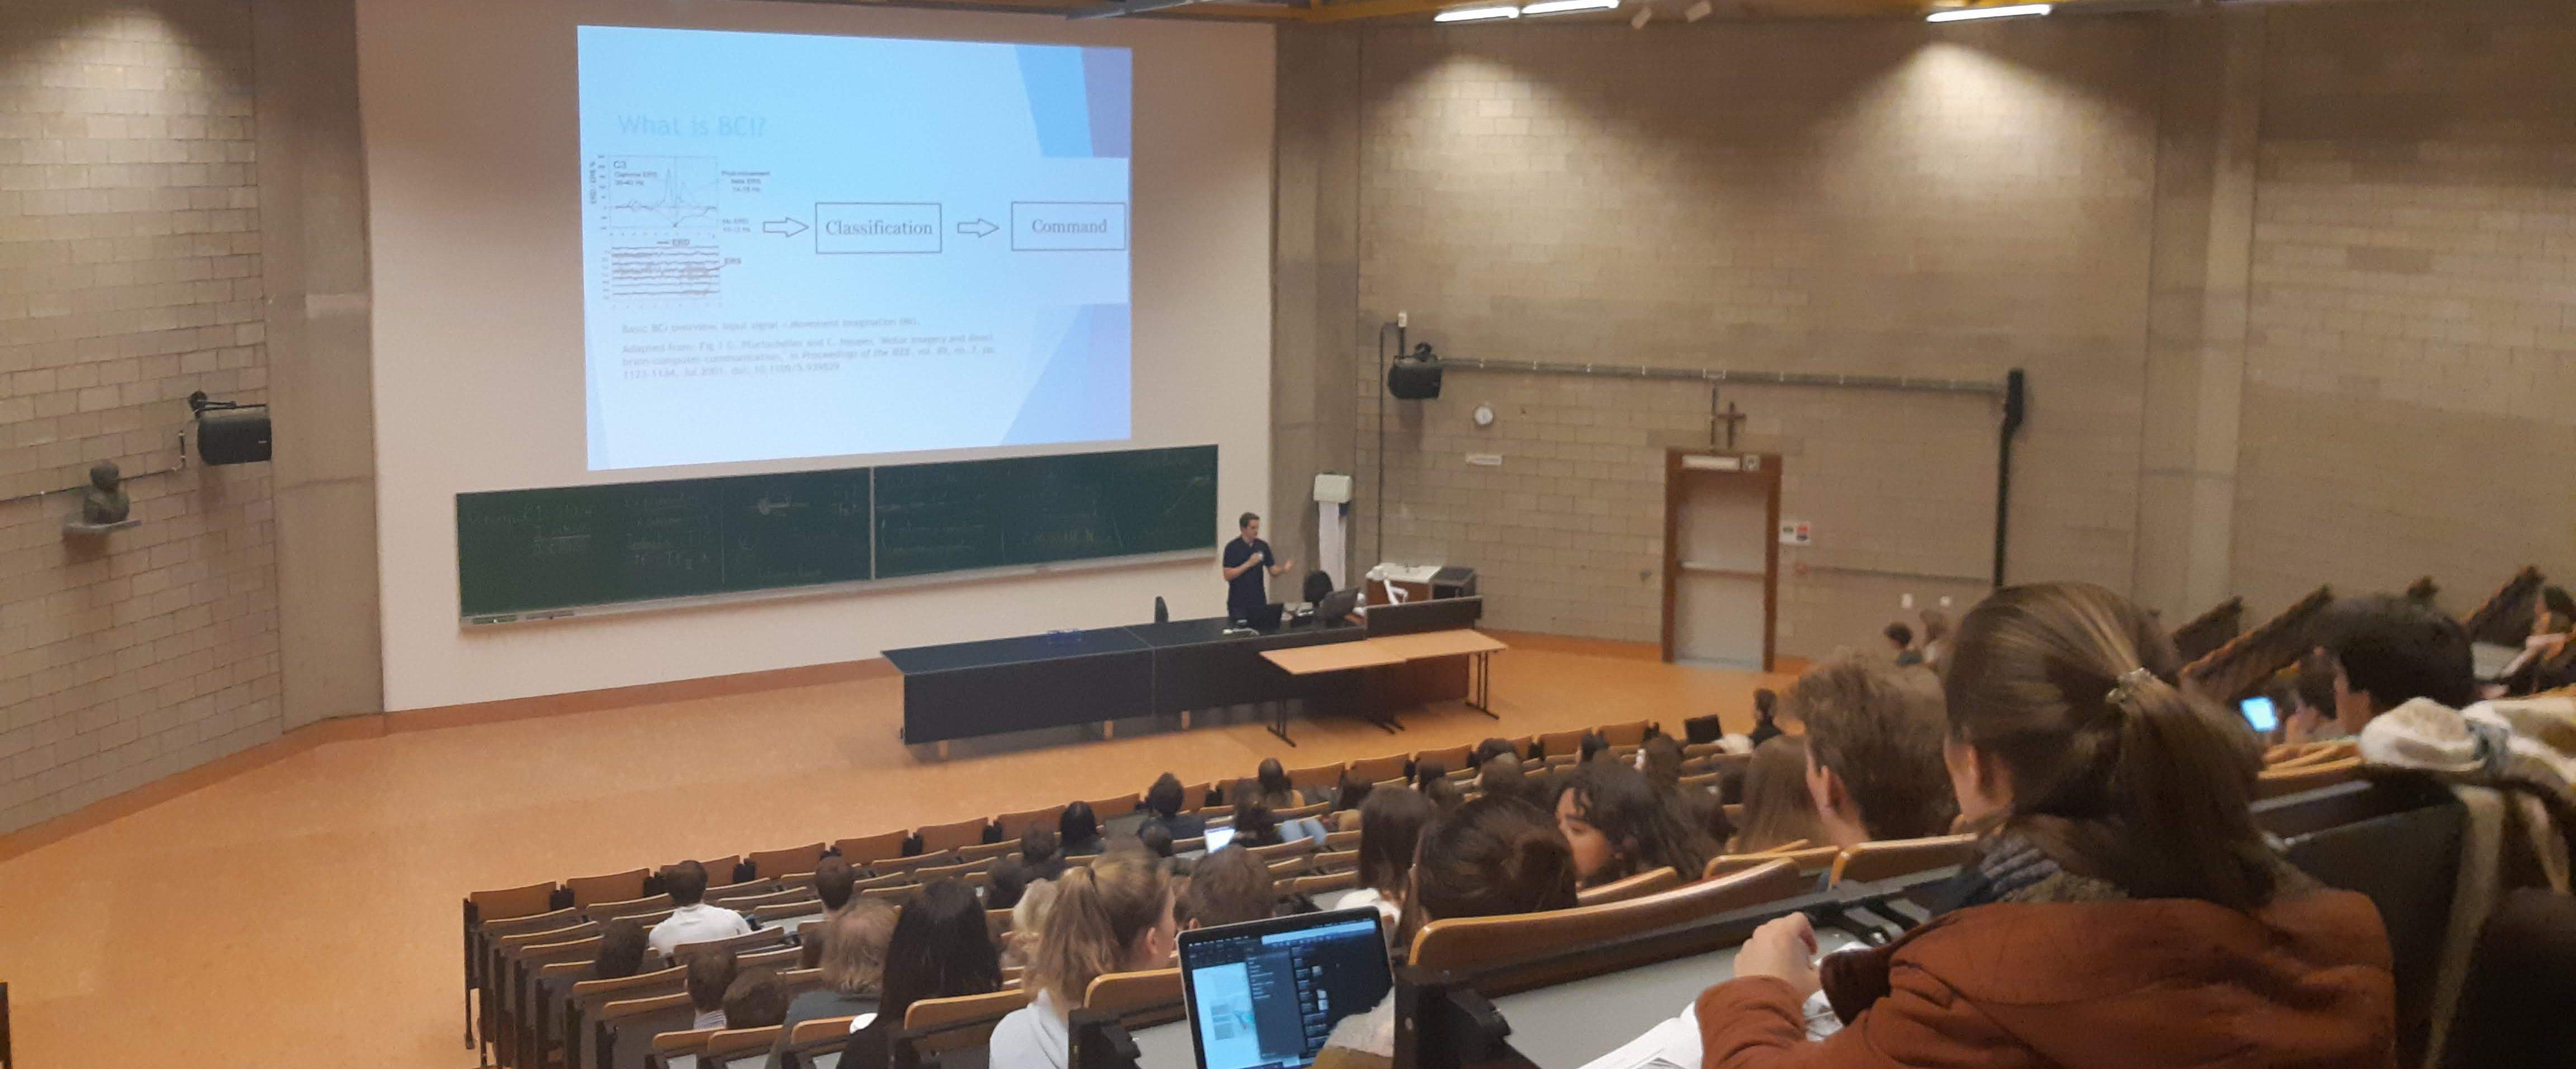 Infosessie statuut student-onderzoeker